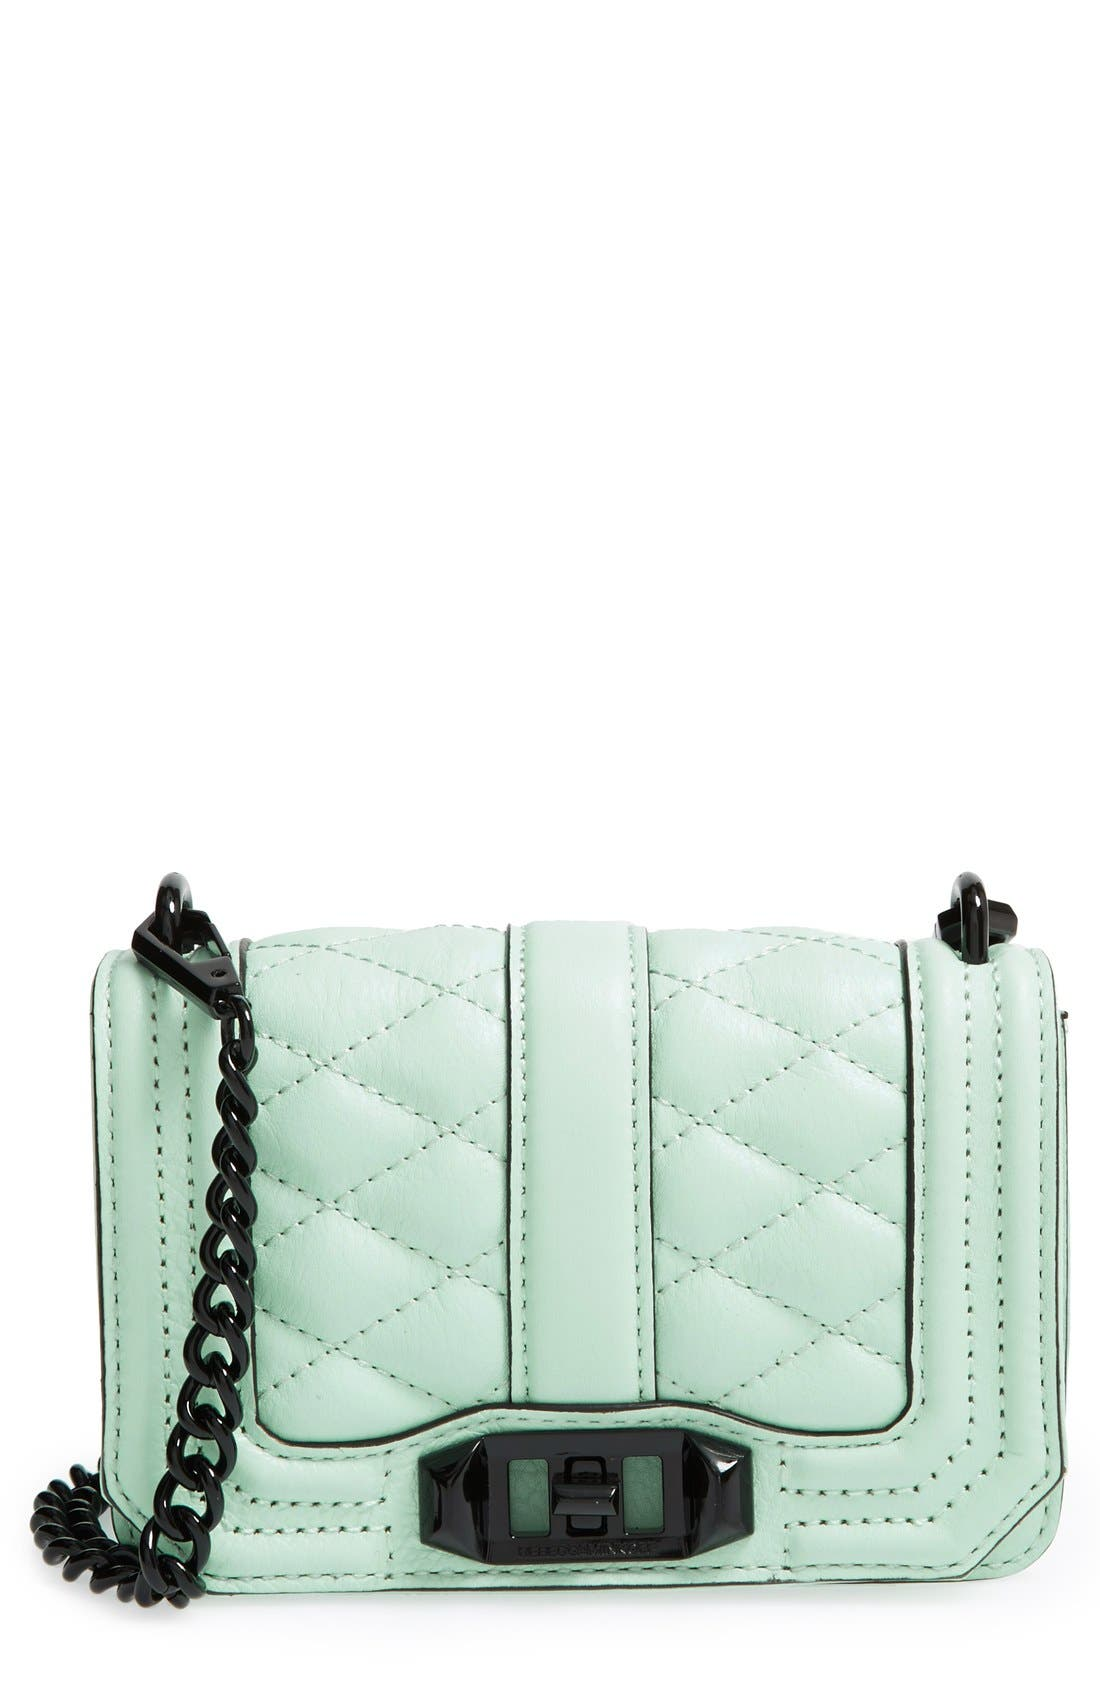 Alternate Image 1 Selected - Rebecca Minkoff 'Mini Love' Crossbody Bag